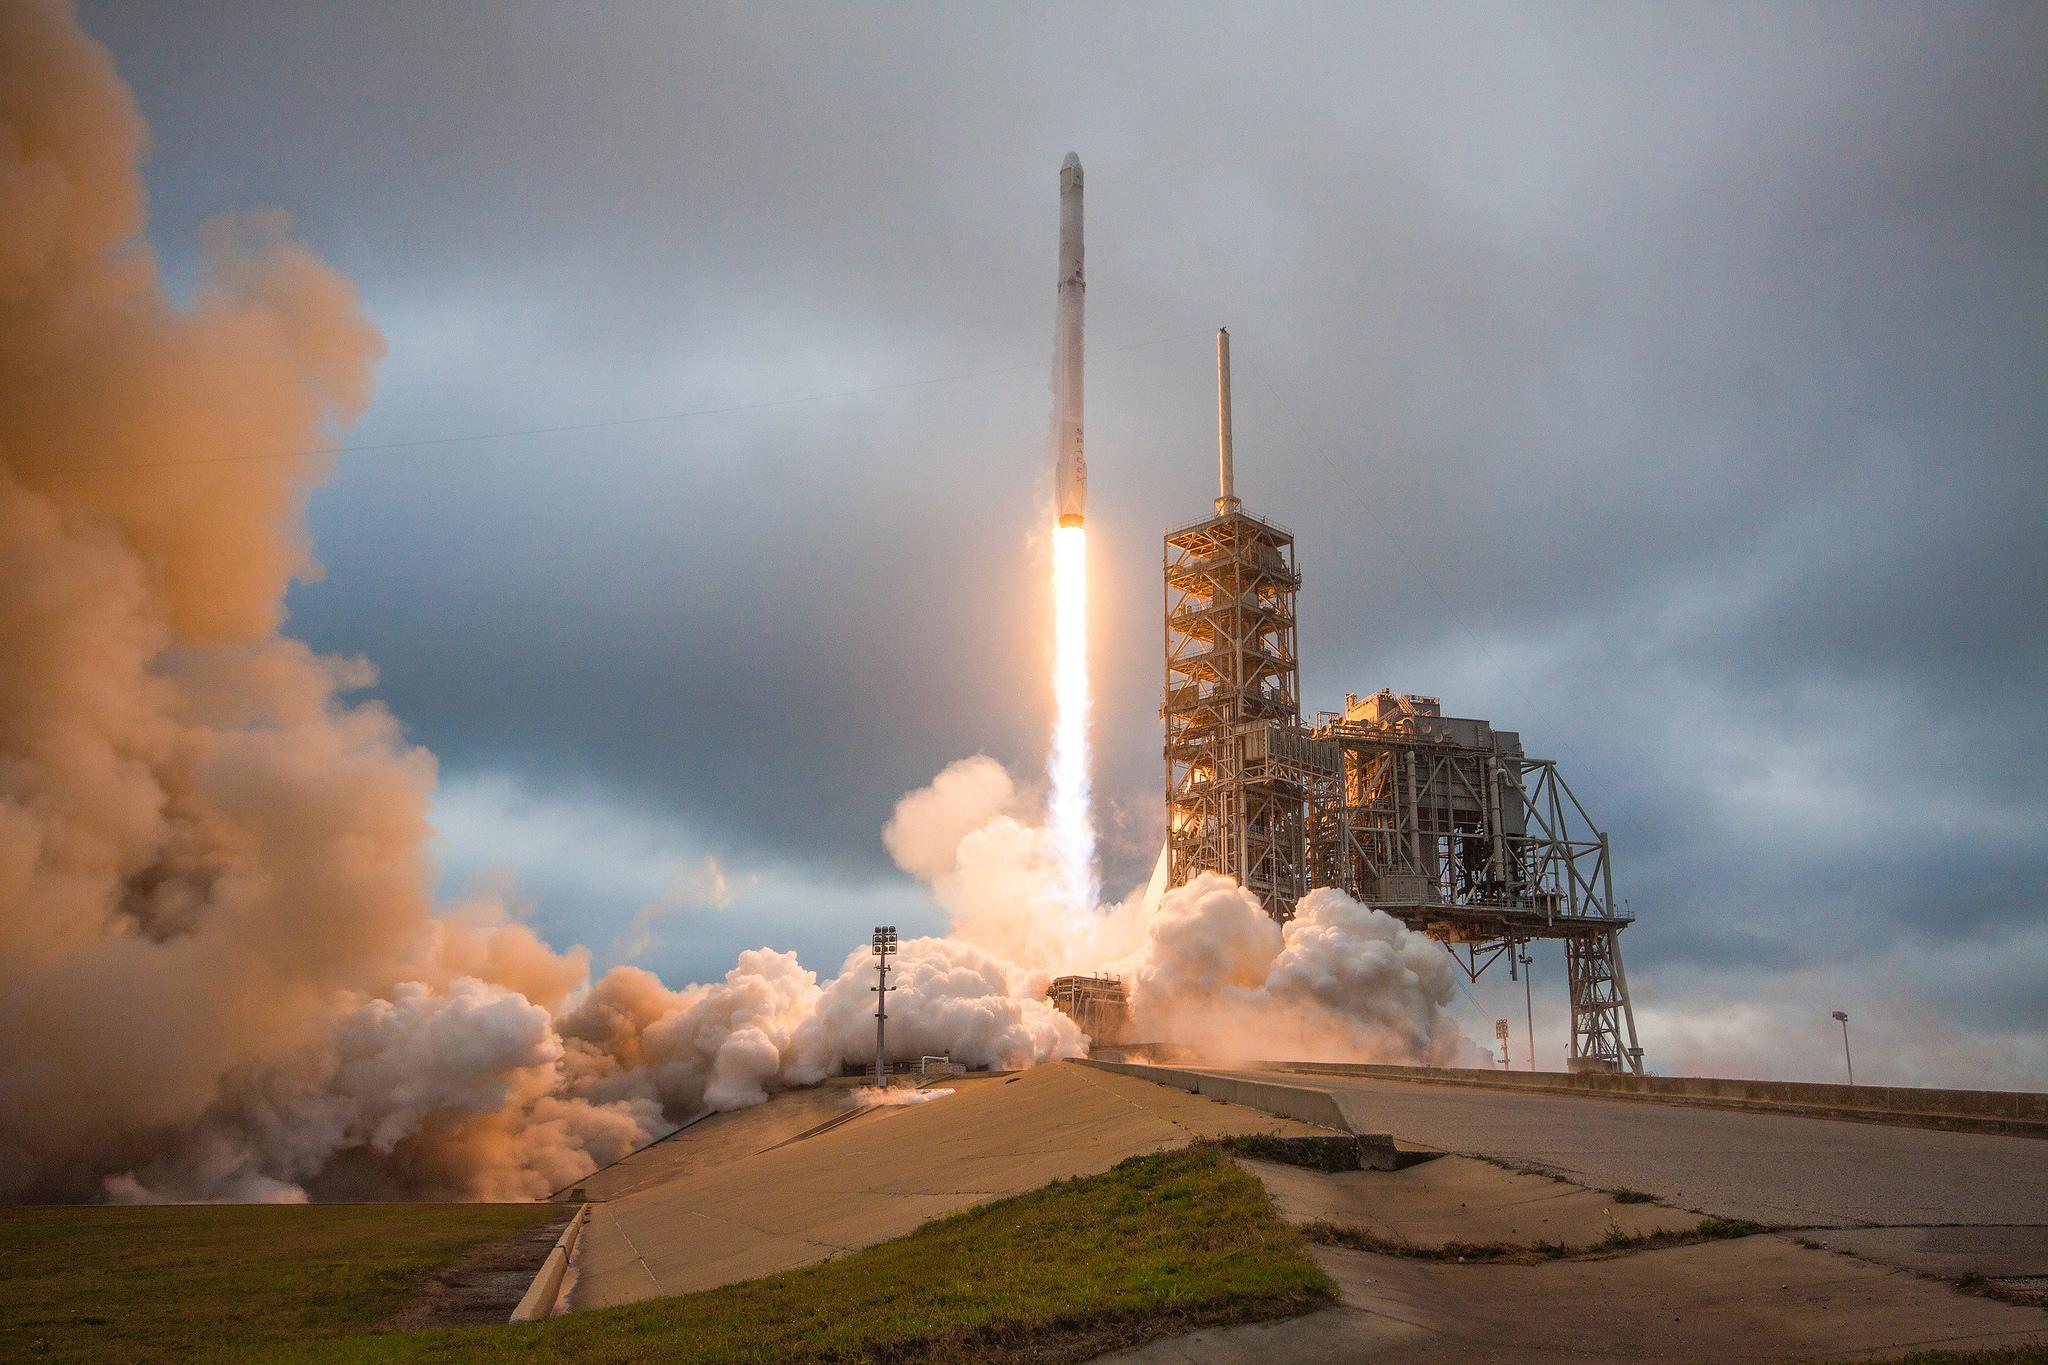 spacex rocket in flight - photo #8